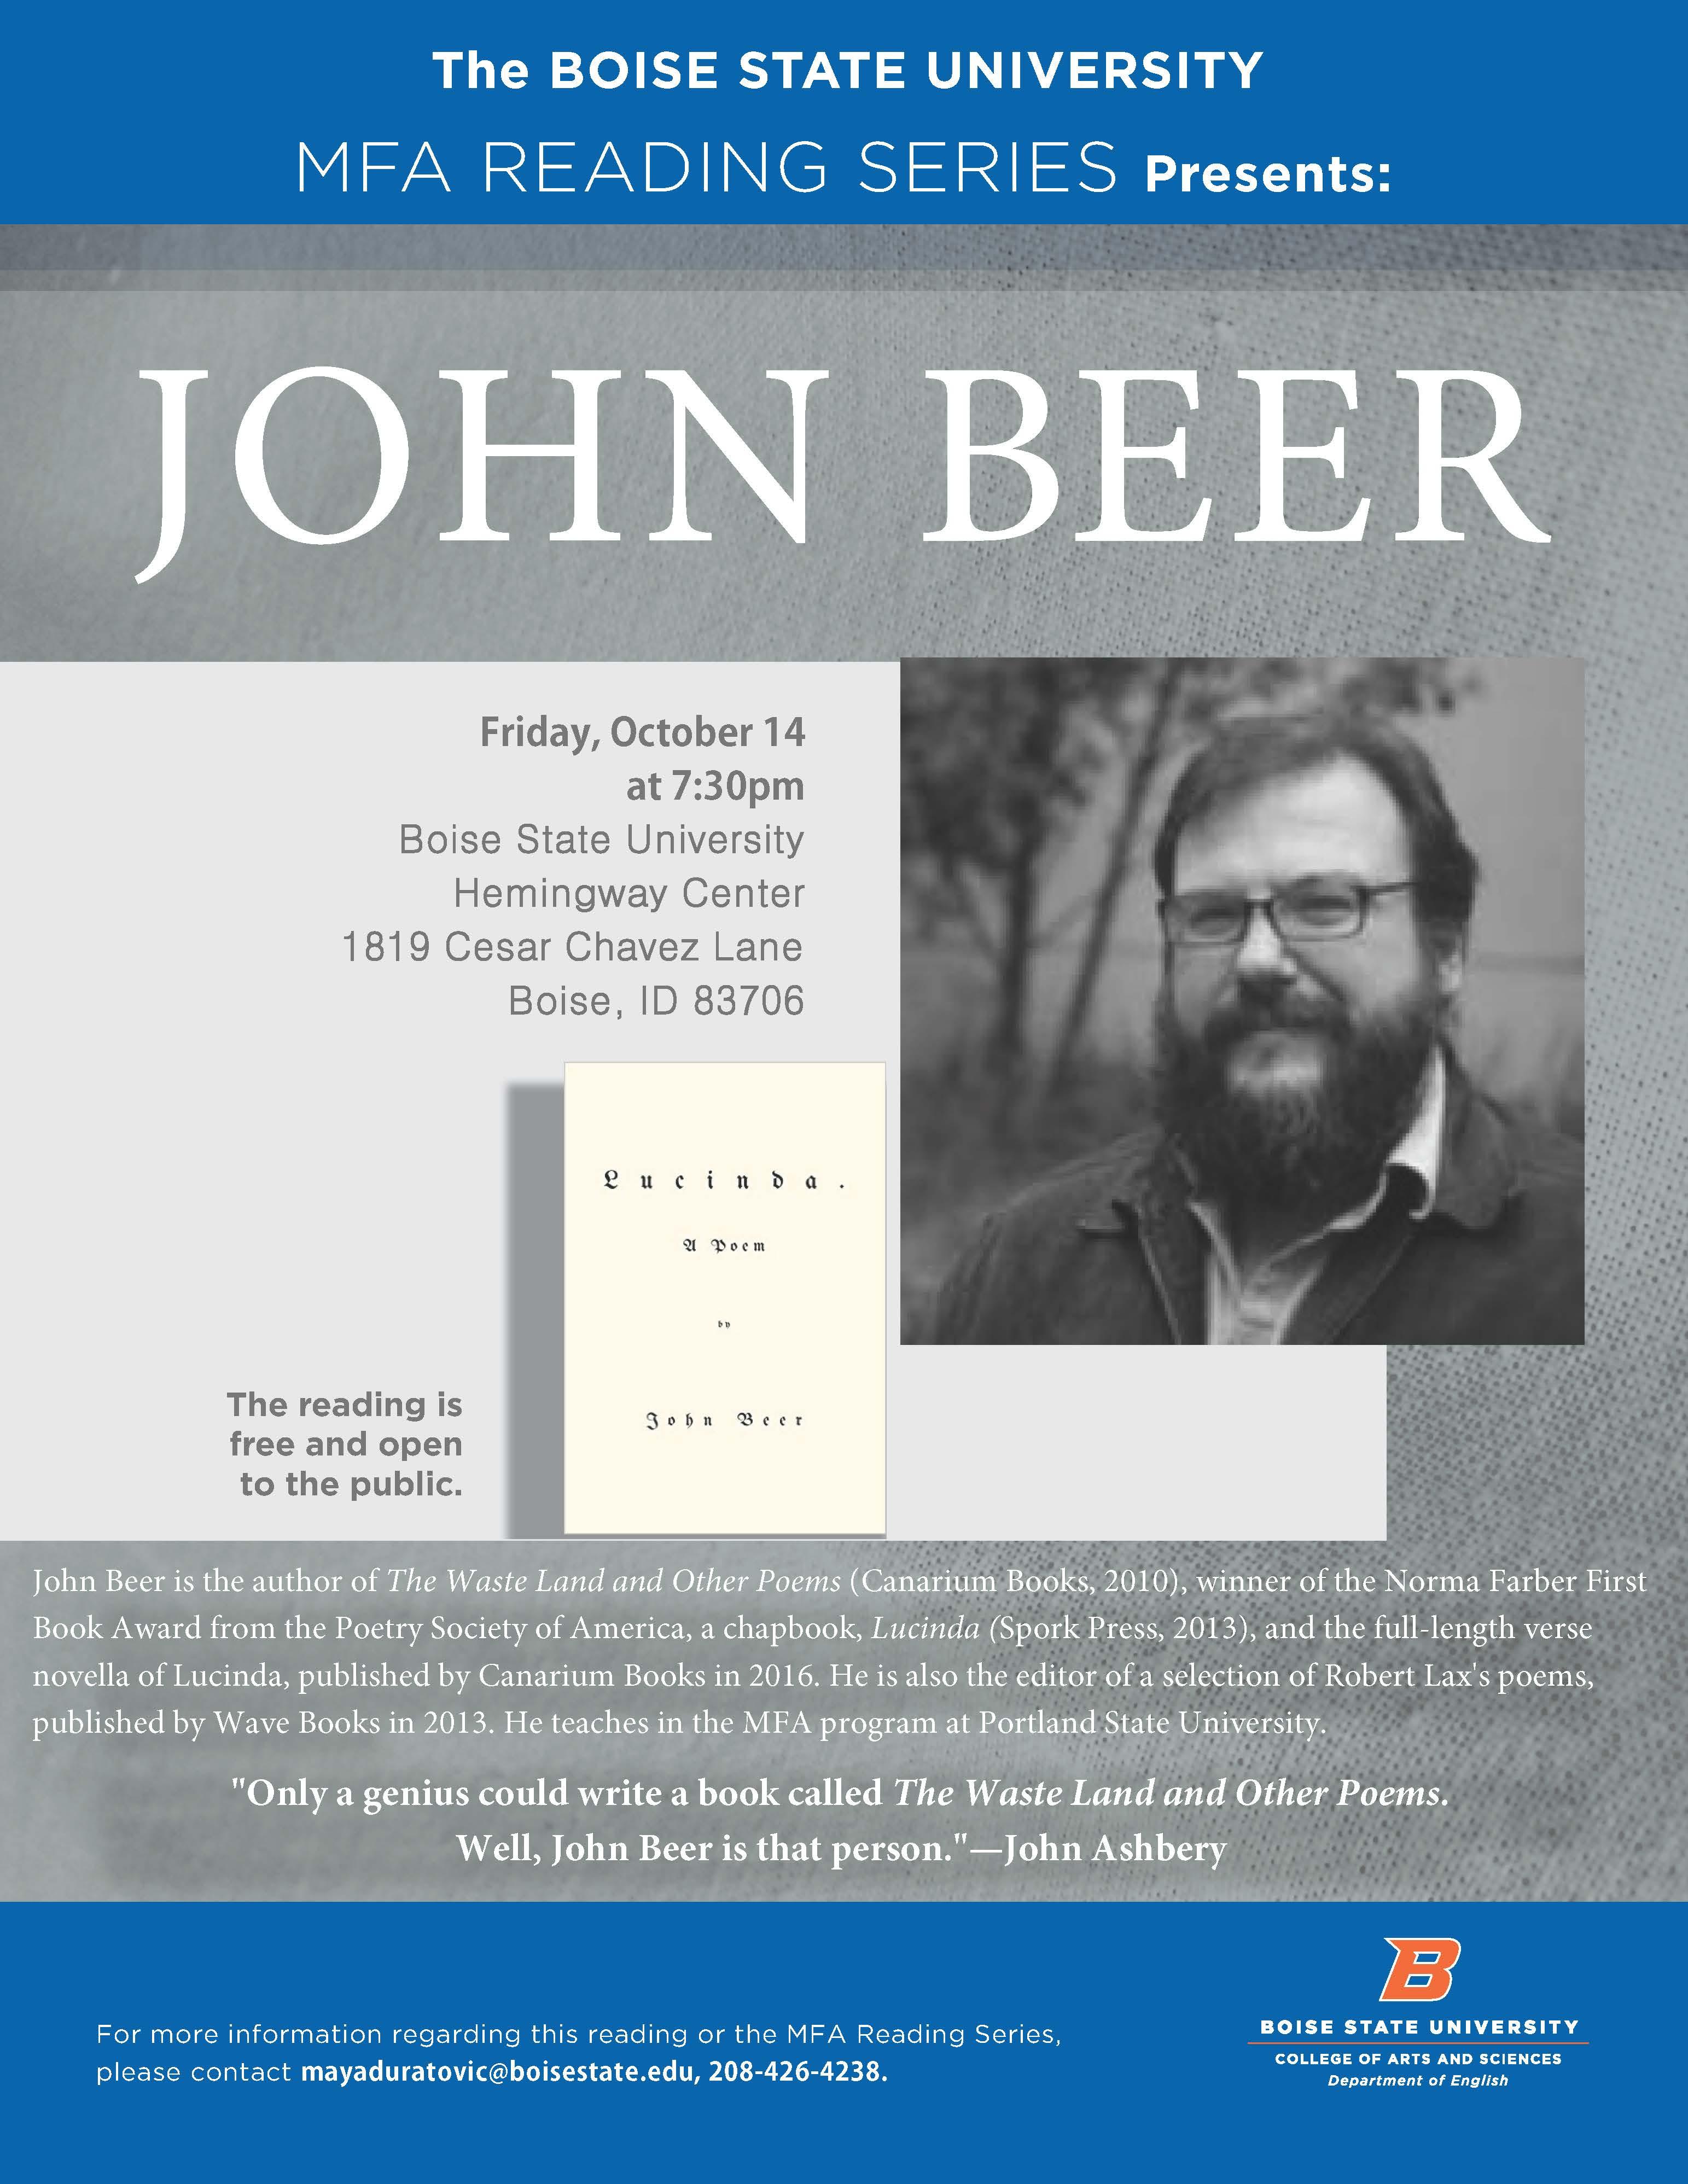 poster of John Beer